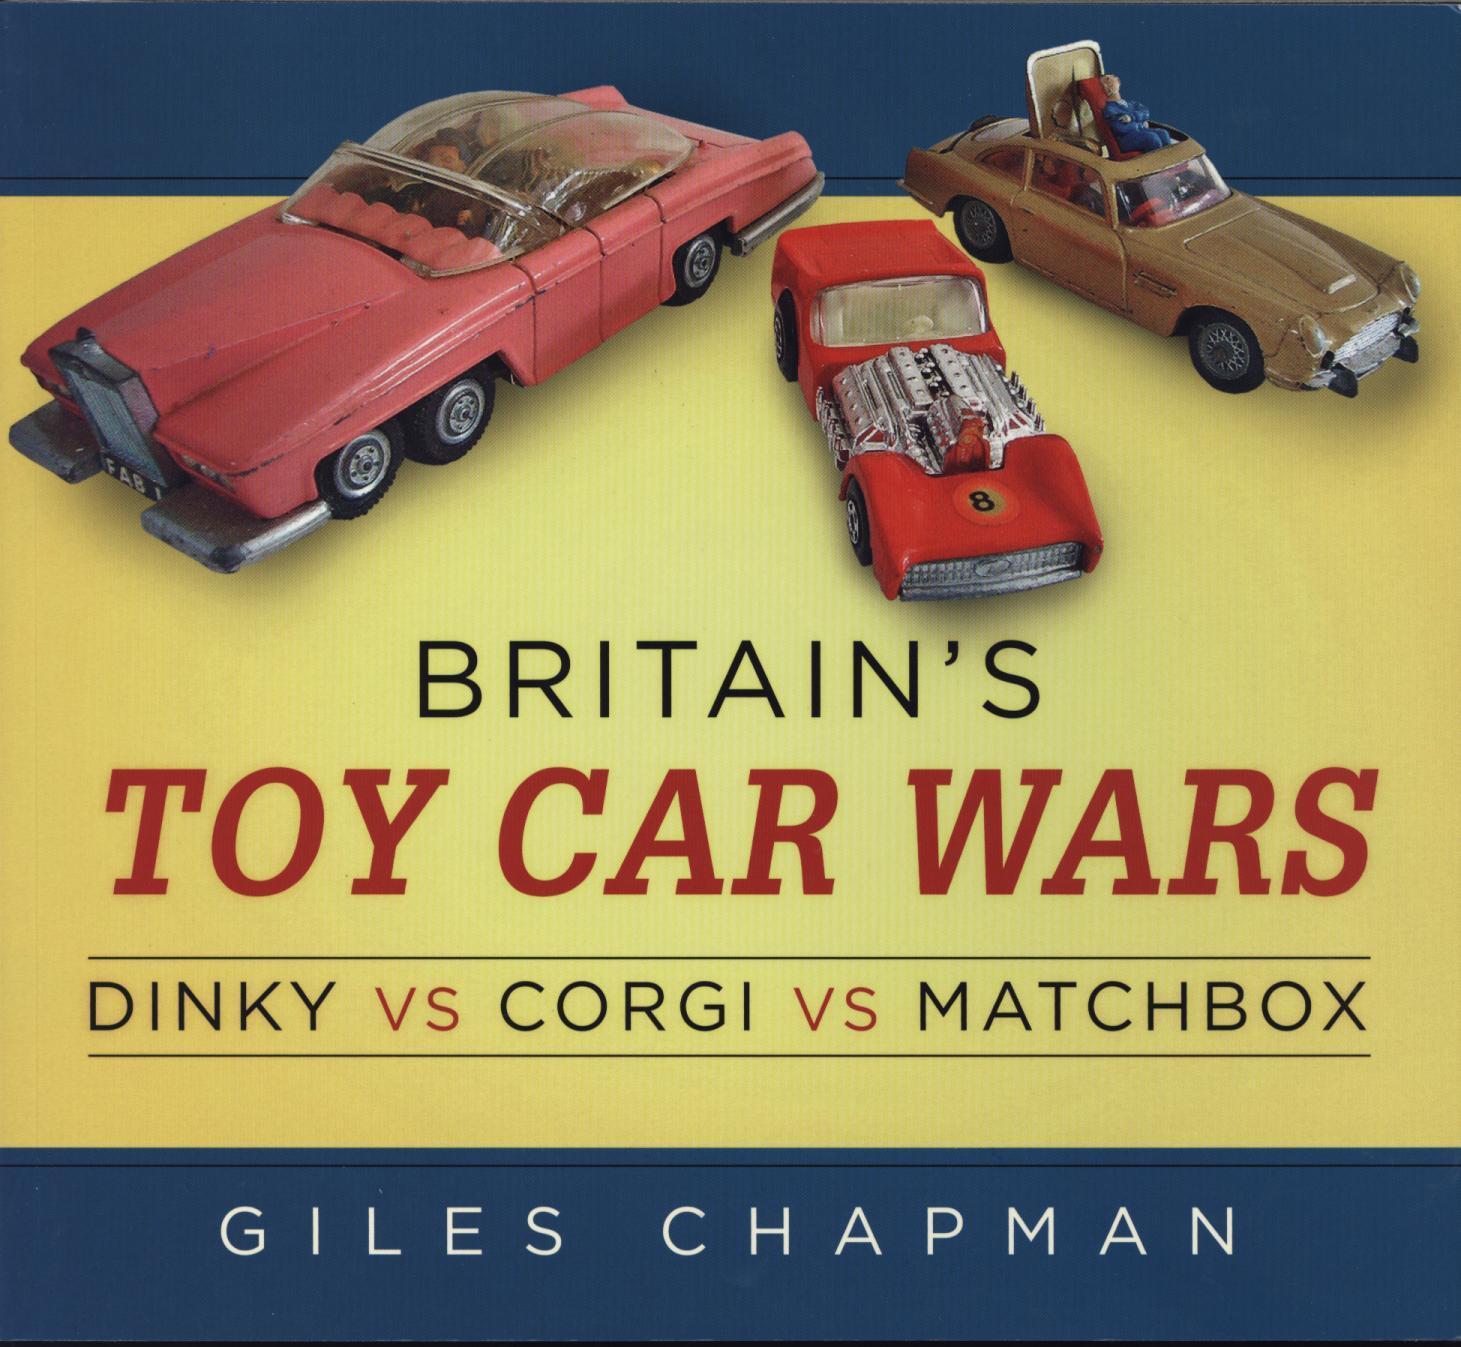 Britain S Toy Car Wars Dinky Vs Corgi Vs Matchbox By Giles Chapman Sevenoaks Bookshop